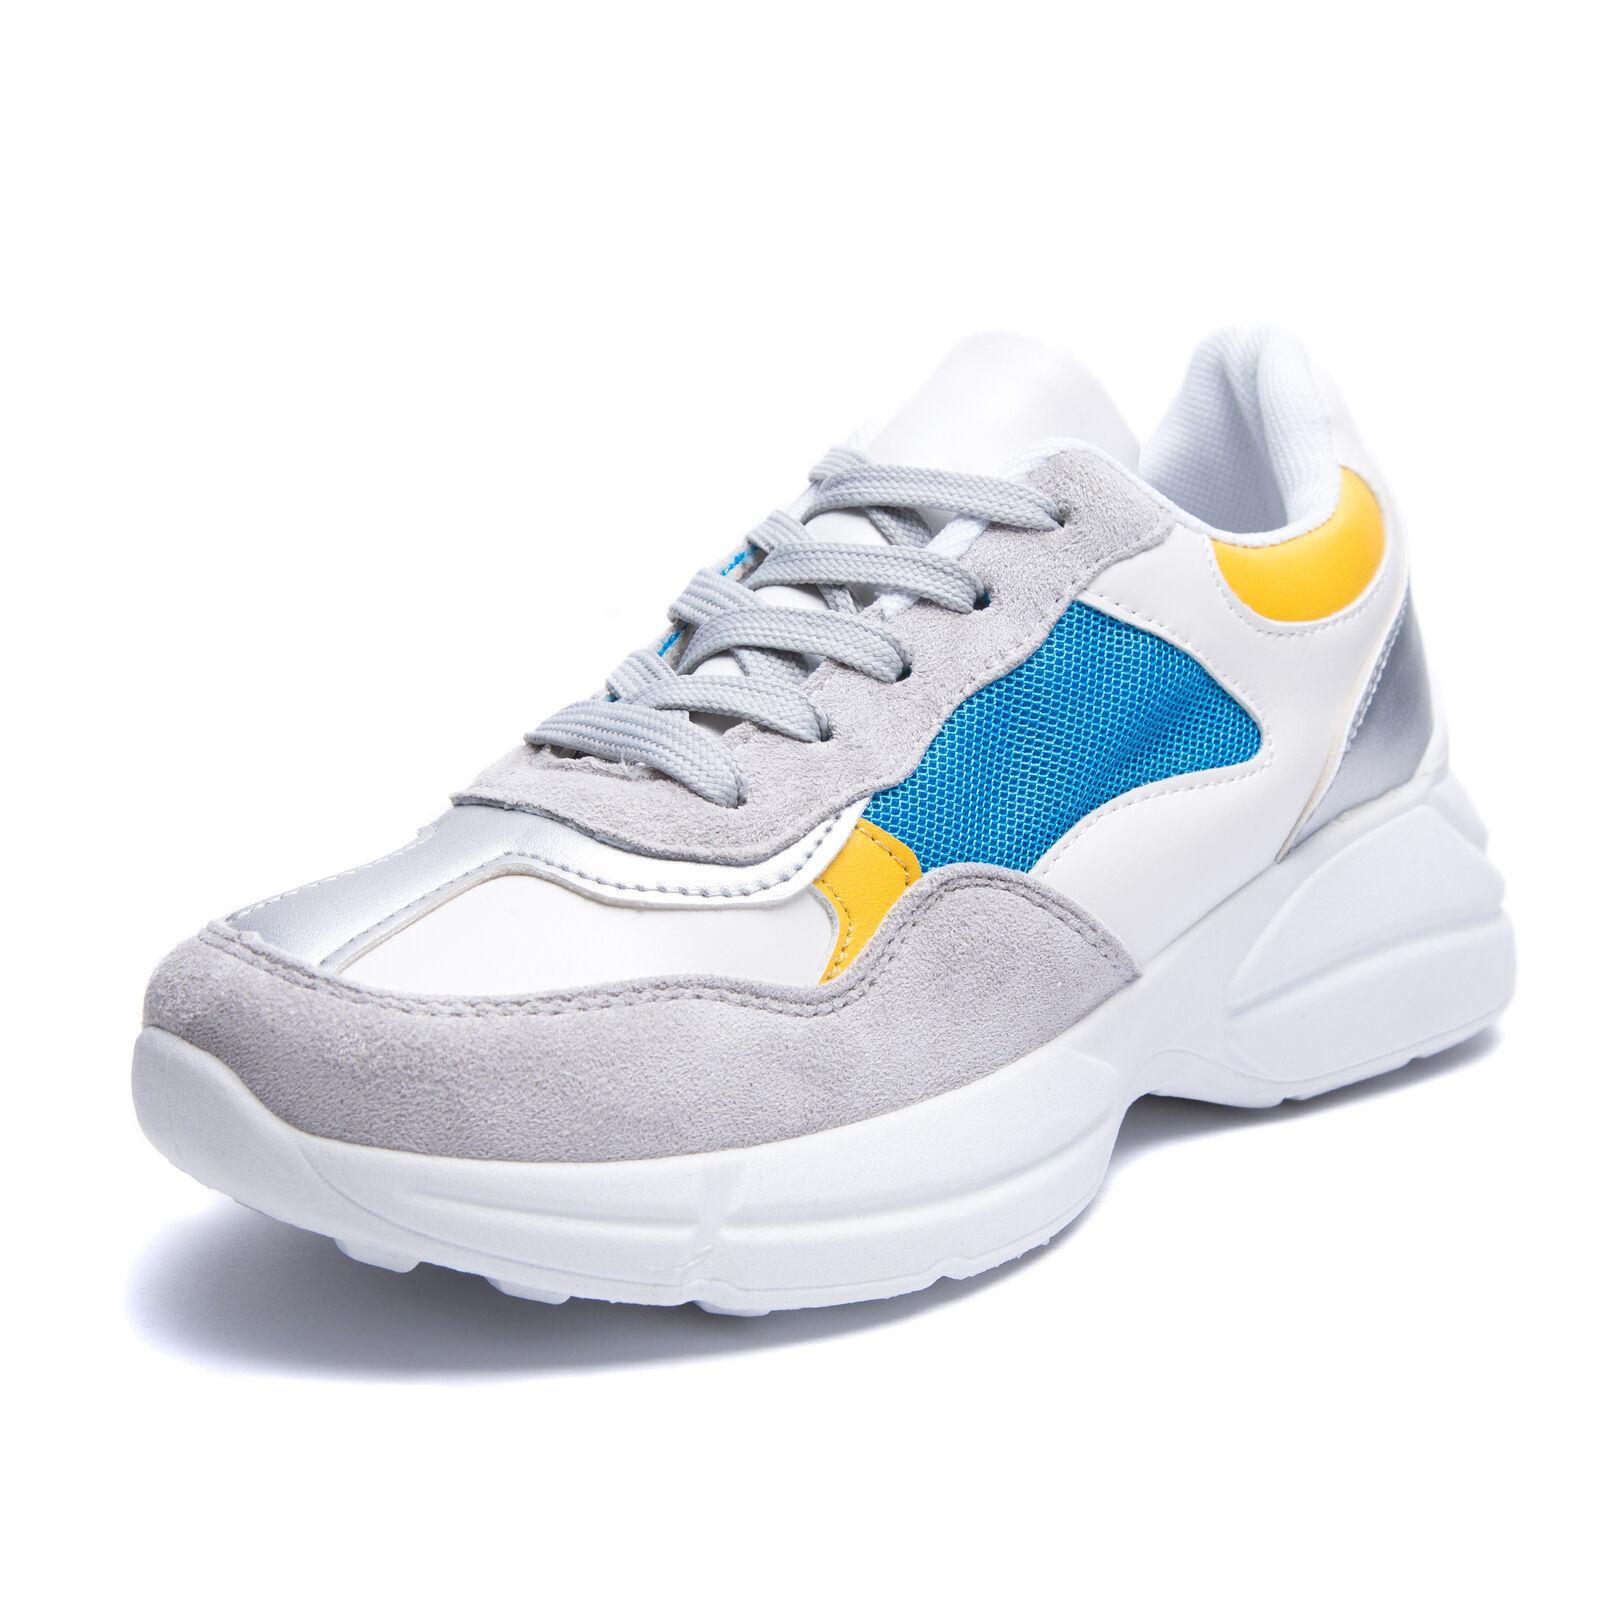 Scarpe donna casual sneakers ginnastica fitness corsa running zeppa moda  vb82059 78080031cc6